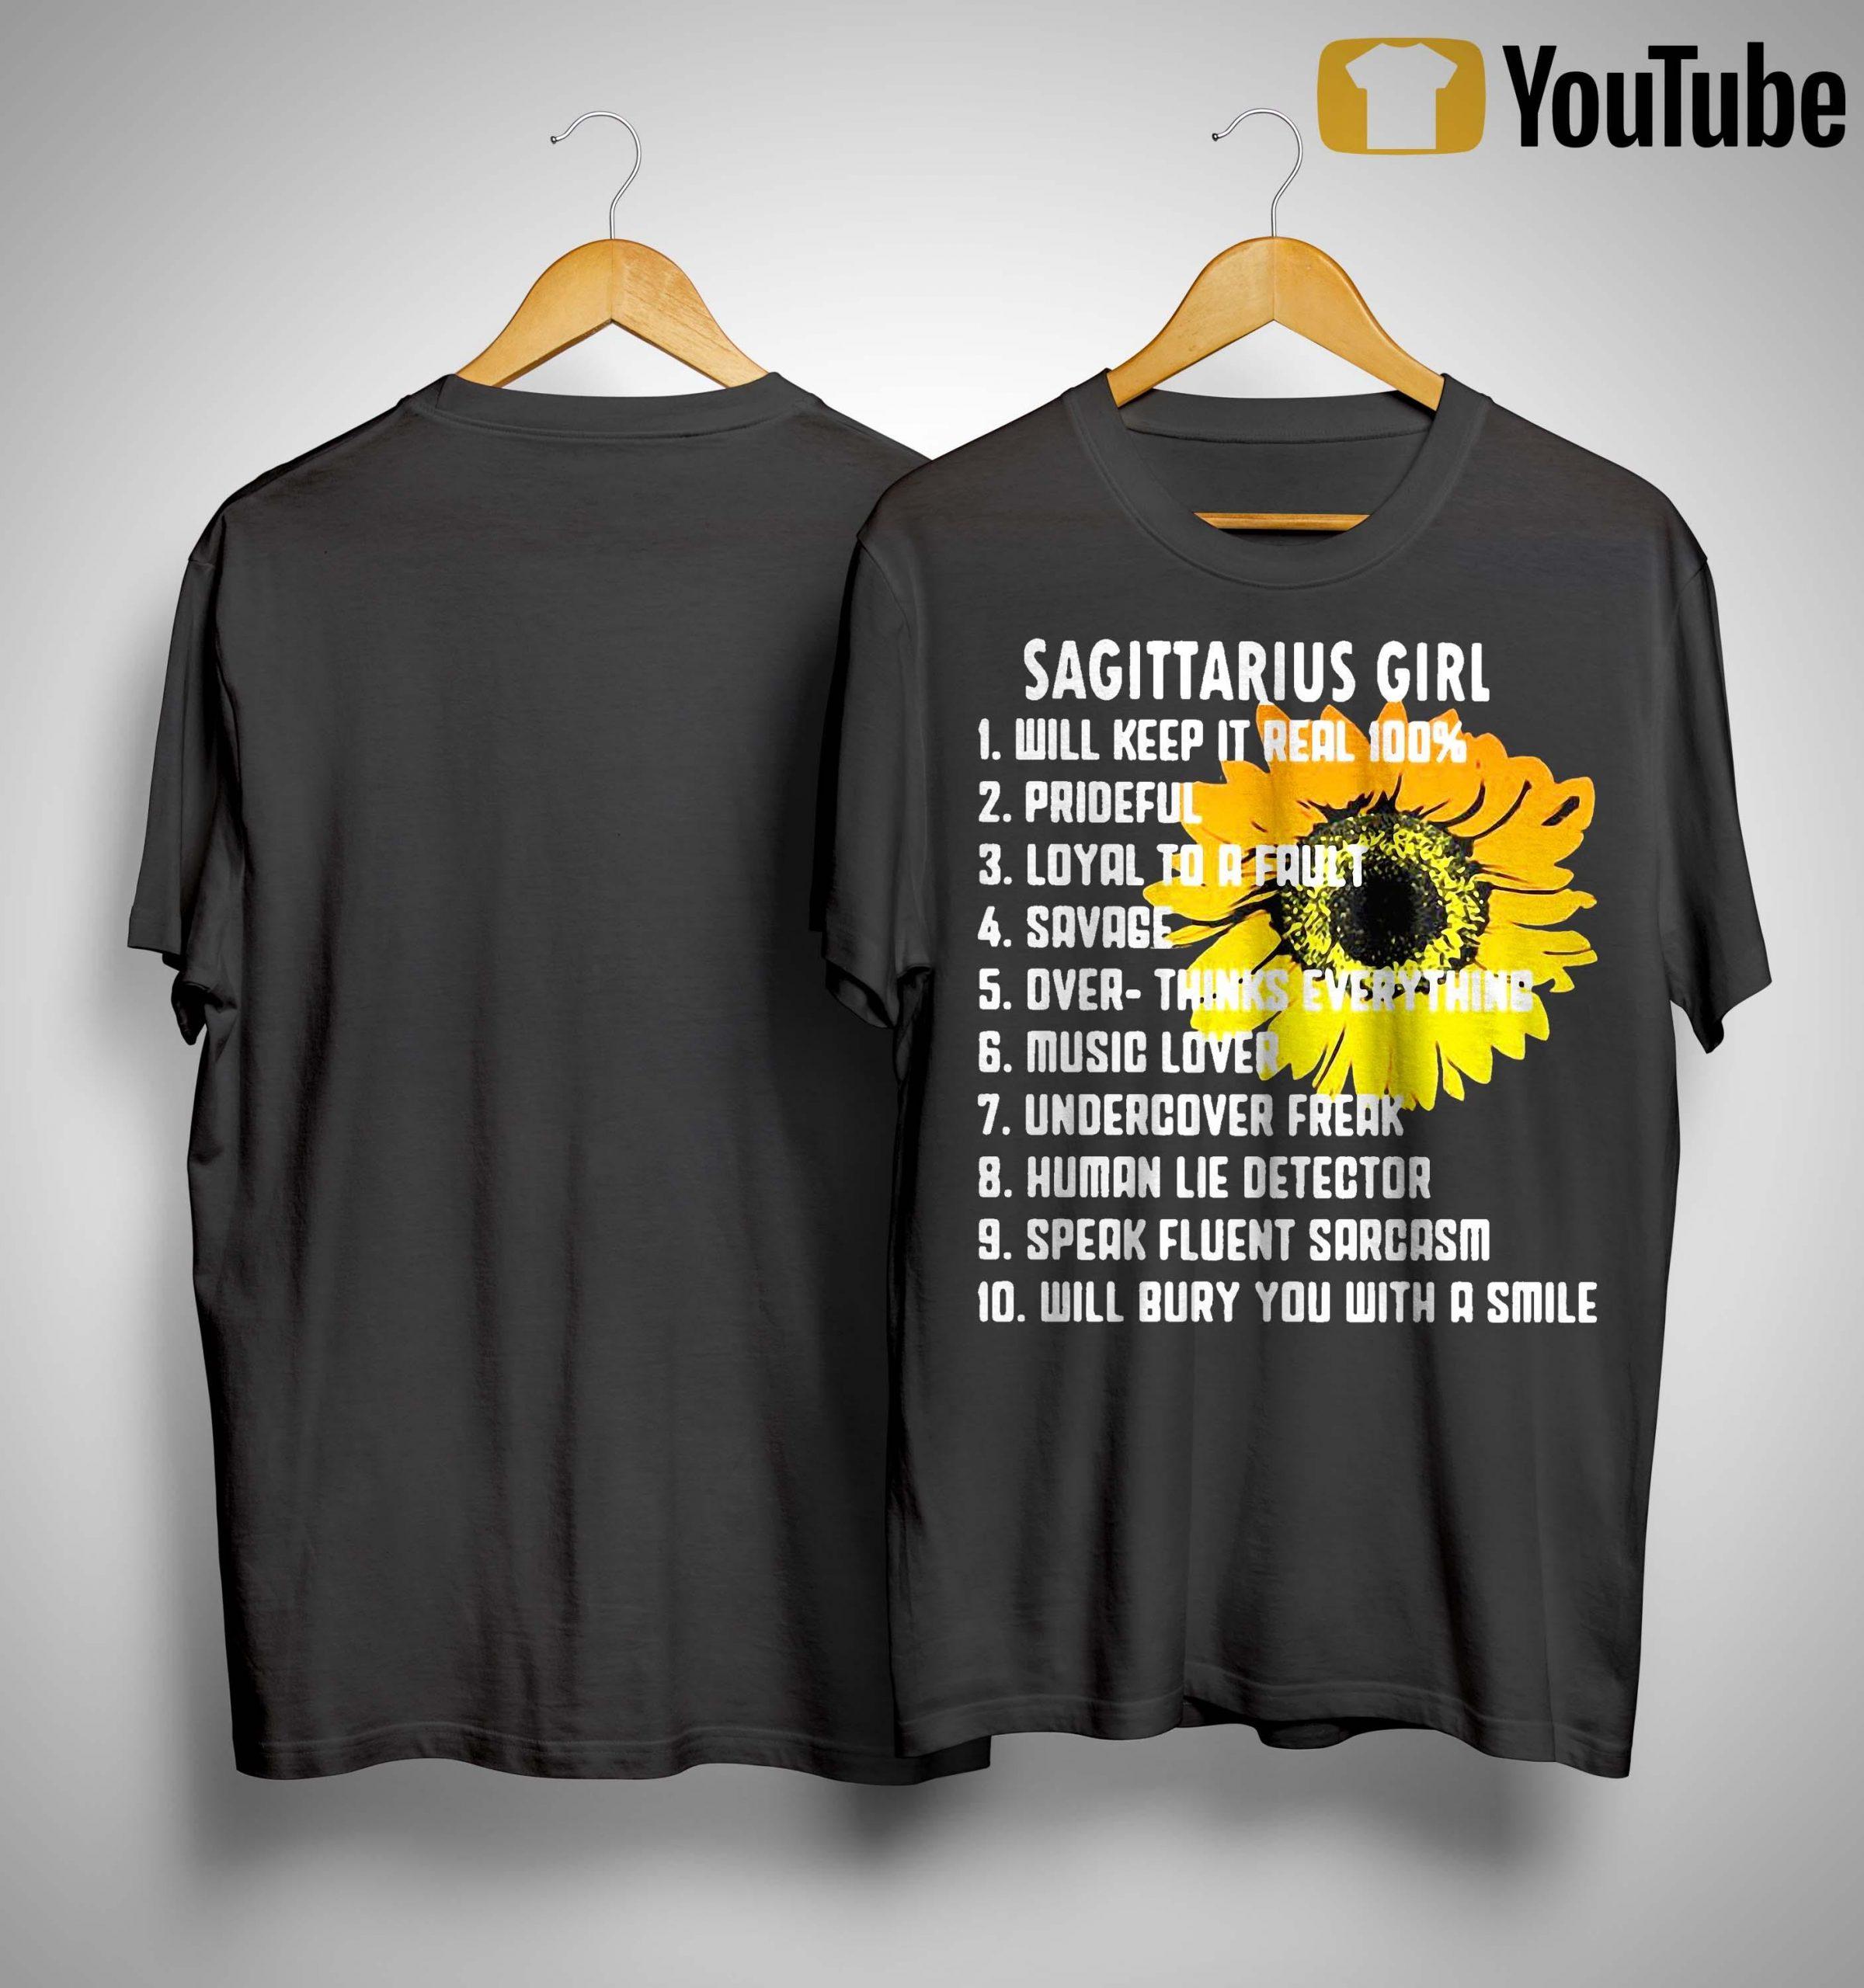 Sagittarius Girl Will Keep It Real 100% Prideful Loyal To A Fault Savage Shirt